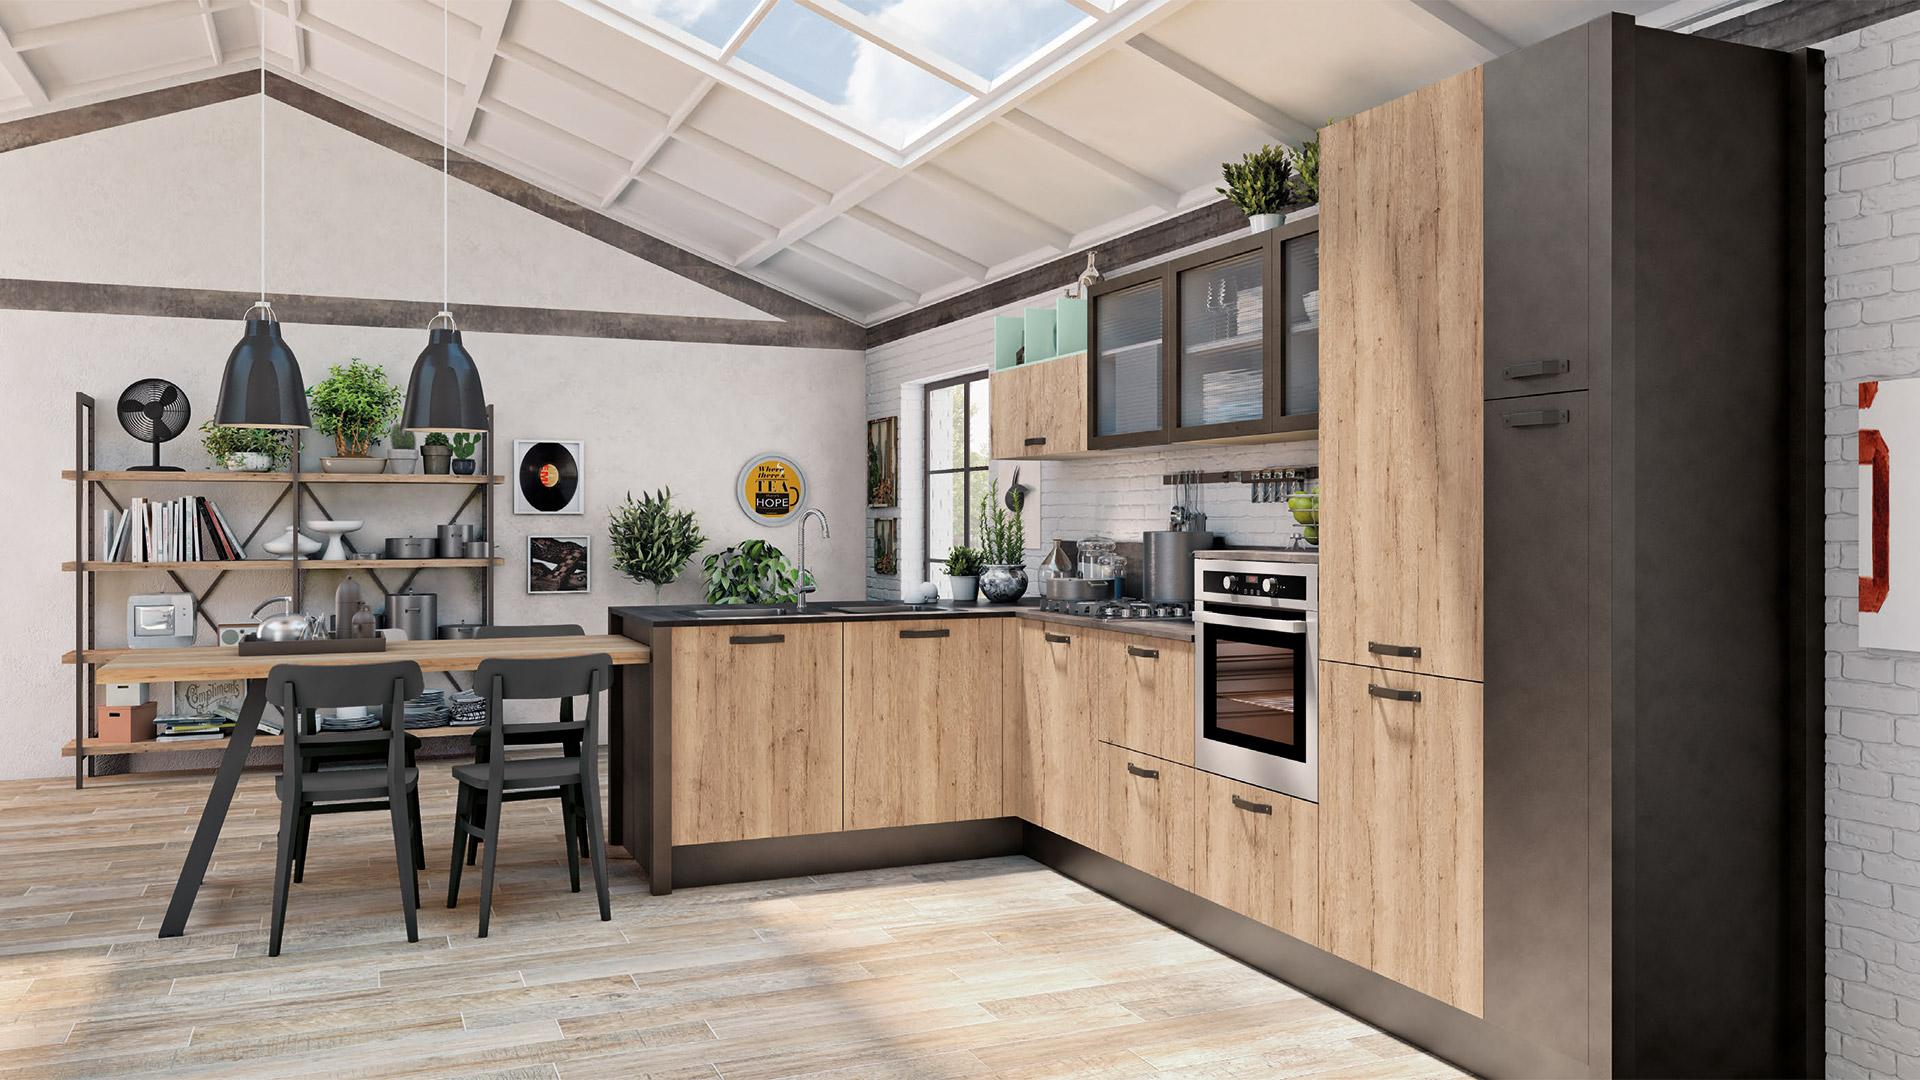 Cucina Kyra Creo Prezzo kyra - modern kitchens - creo kitchens